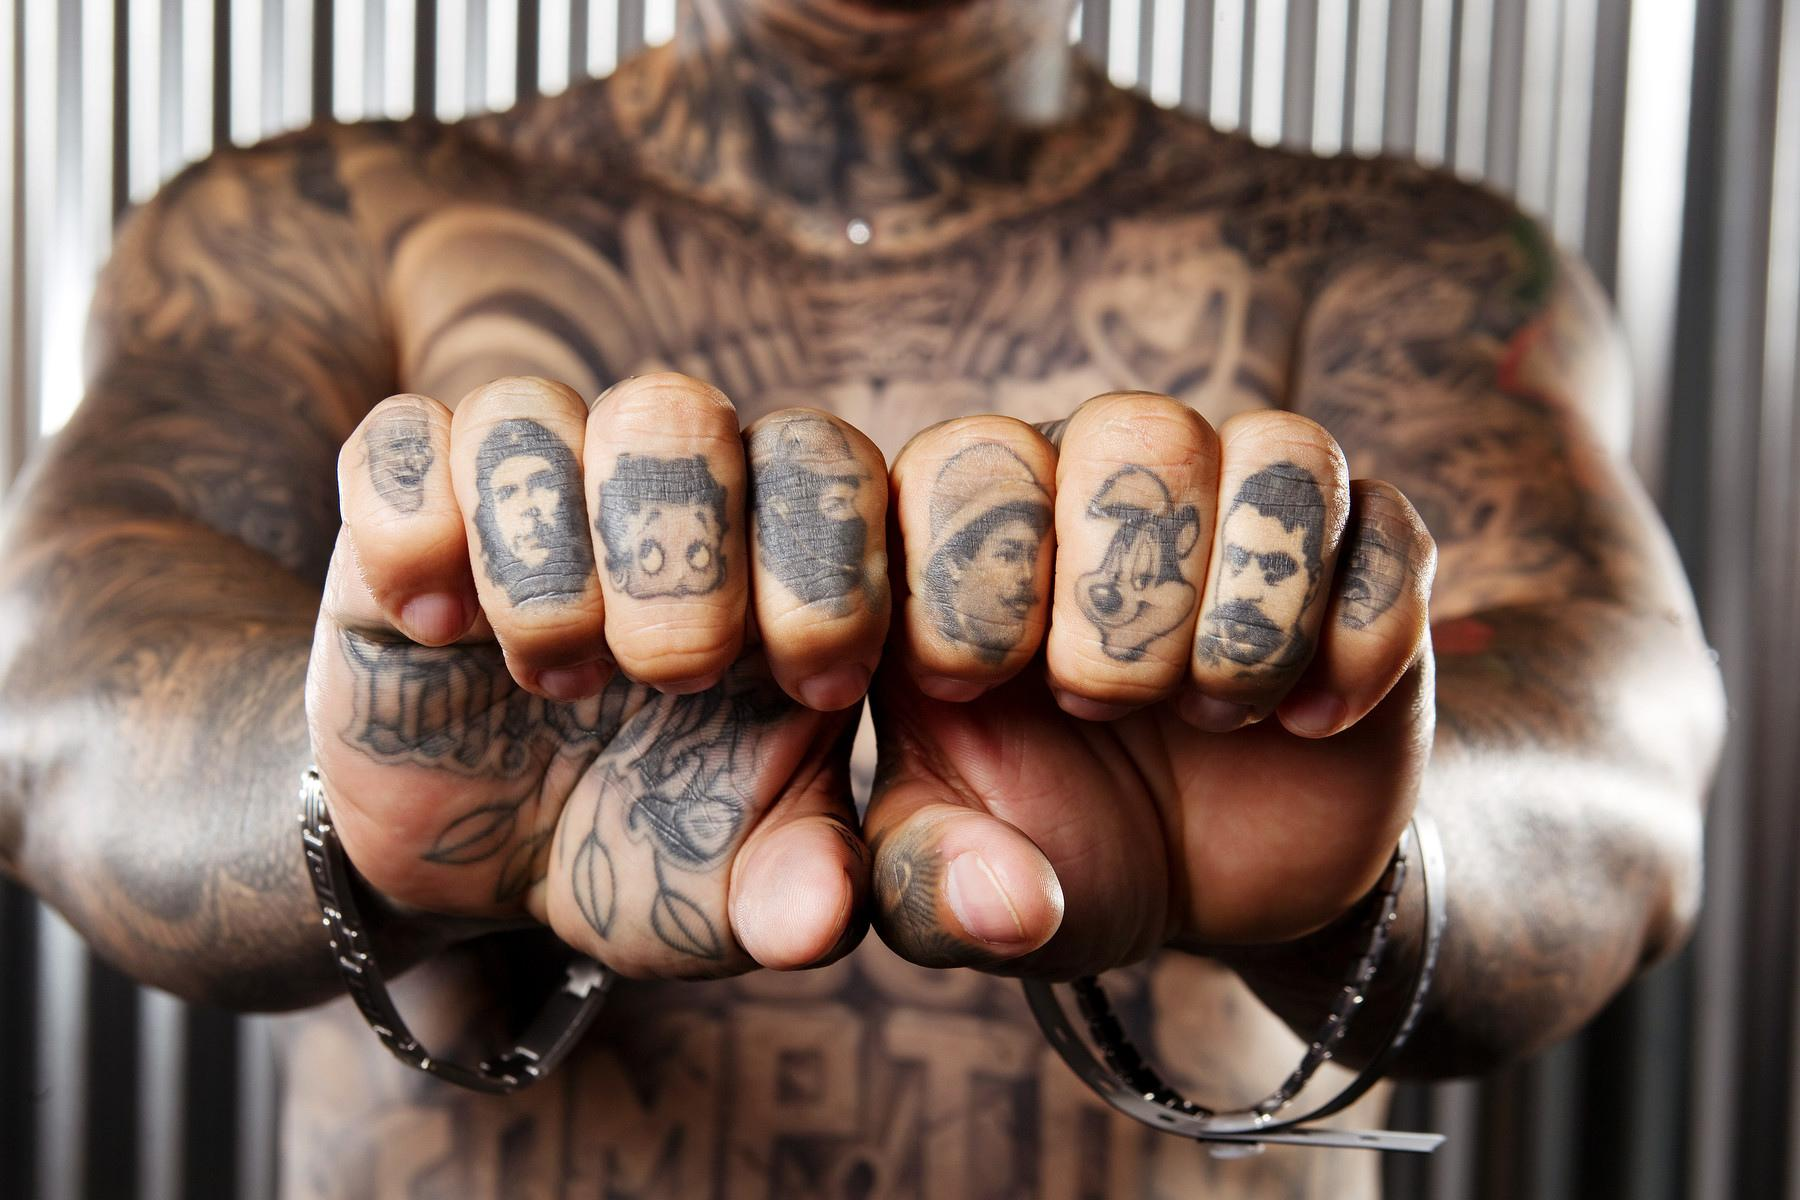 Tattoo Artistic wallpapers HD quality